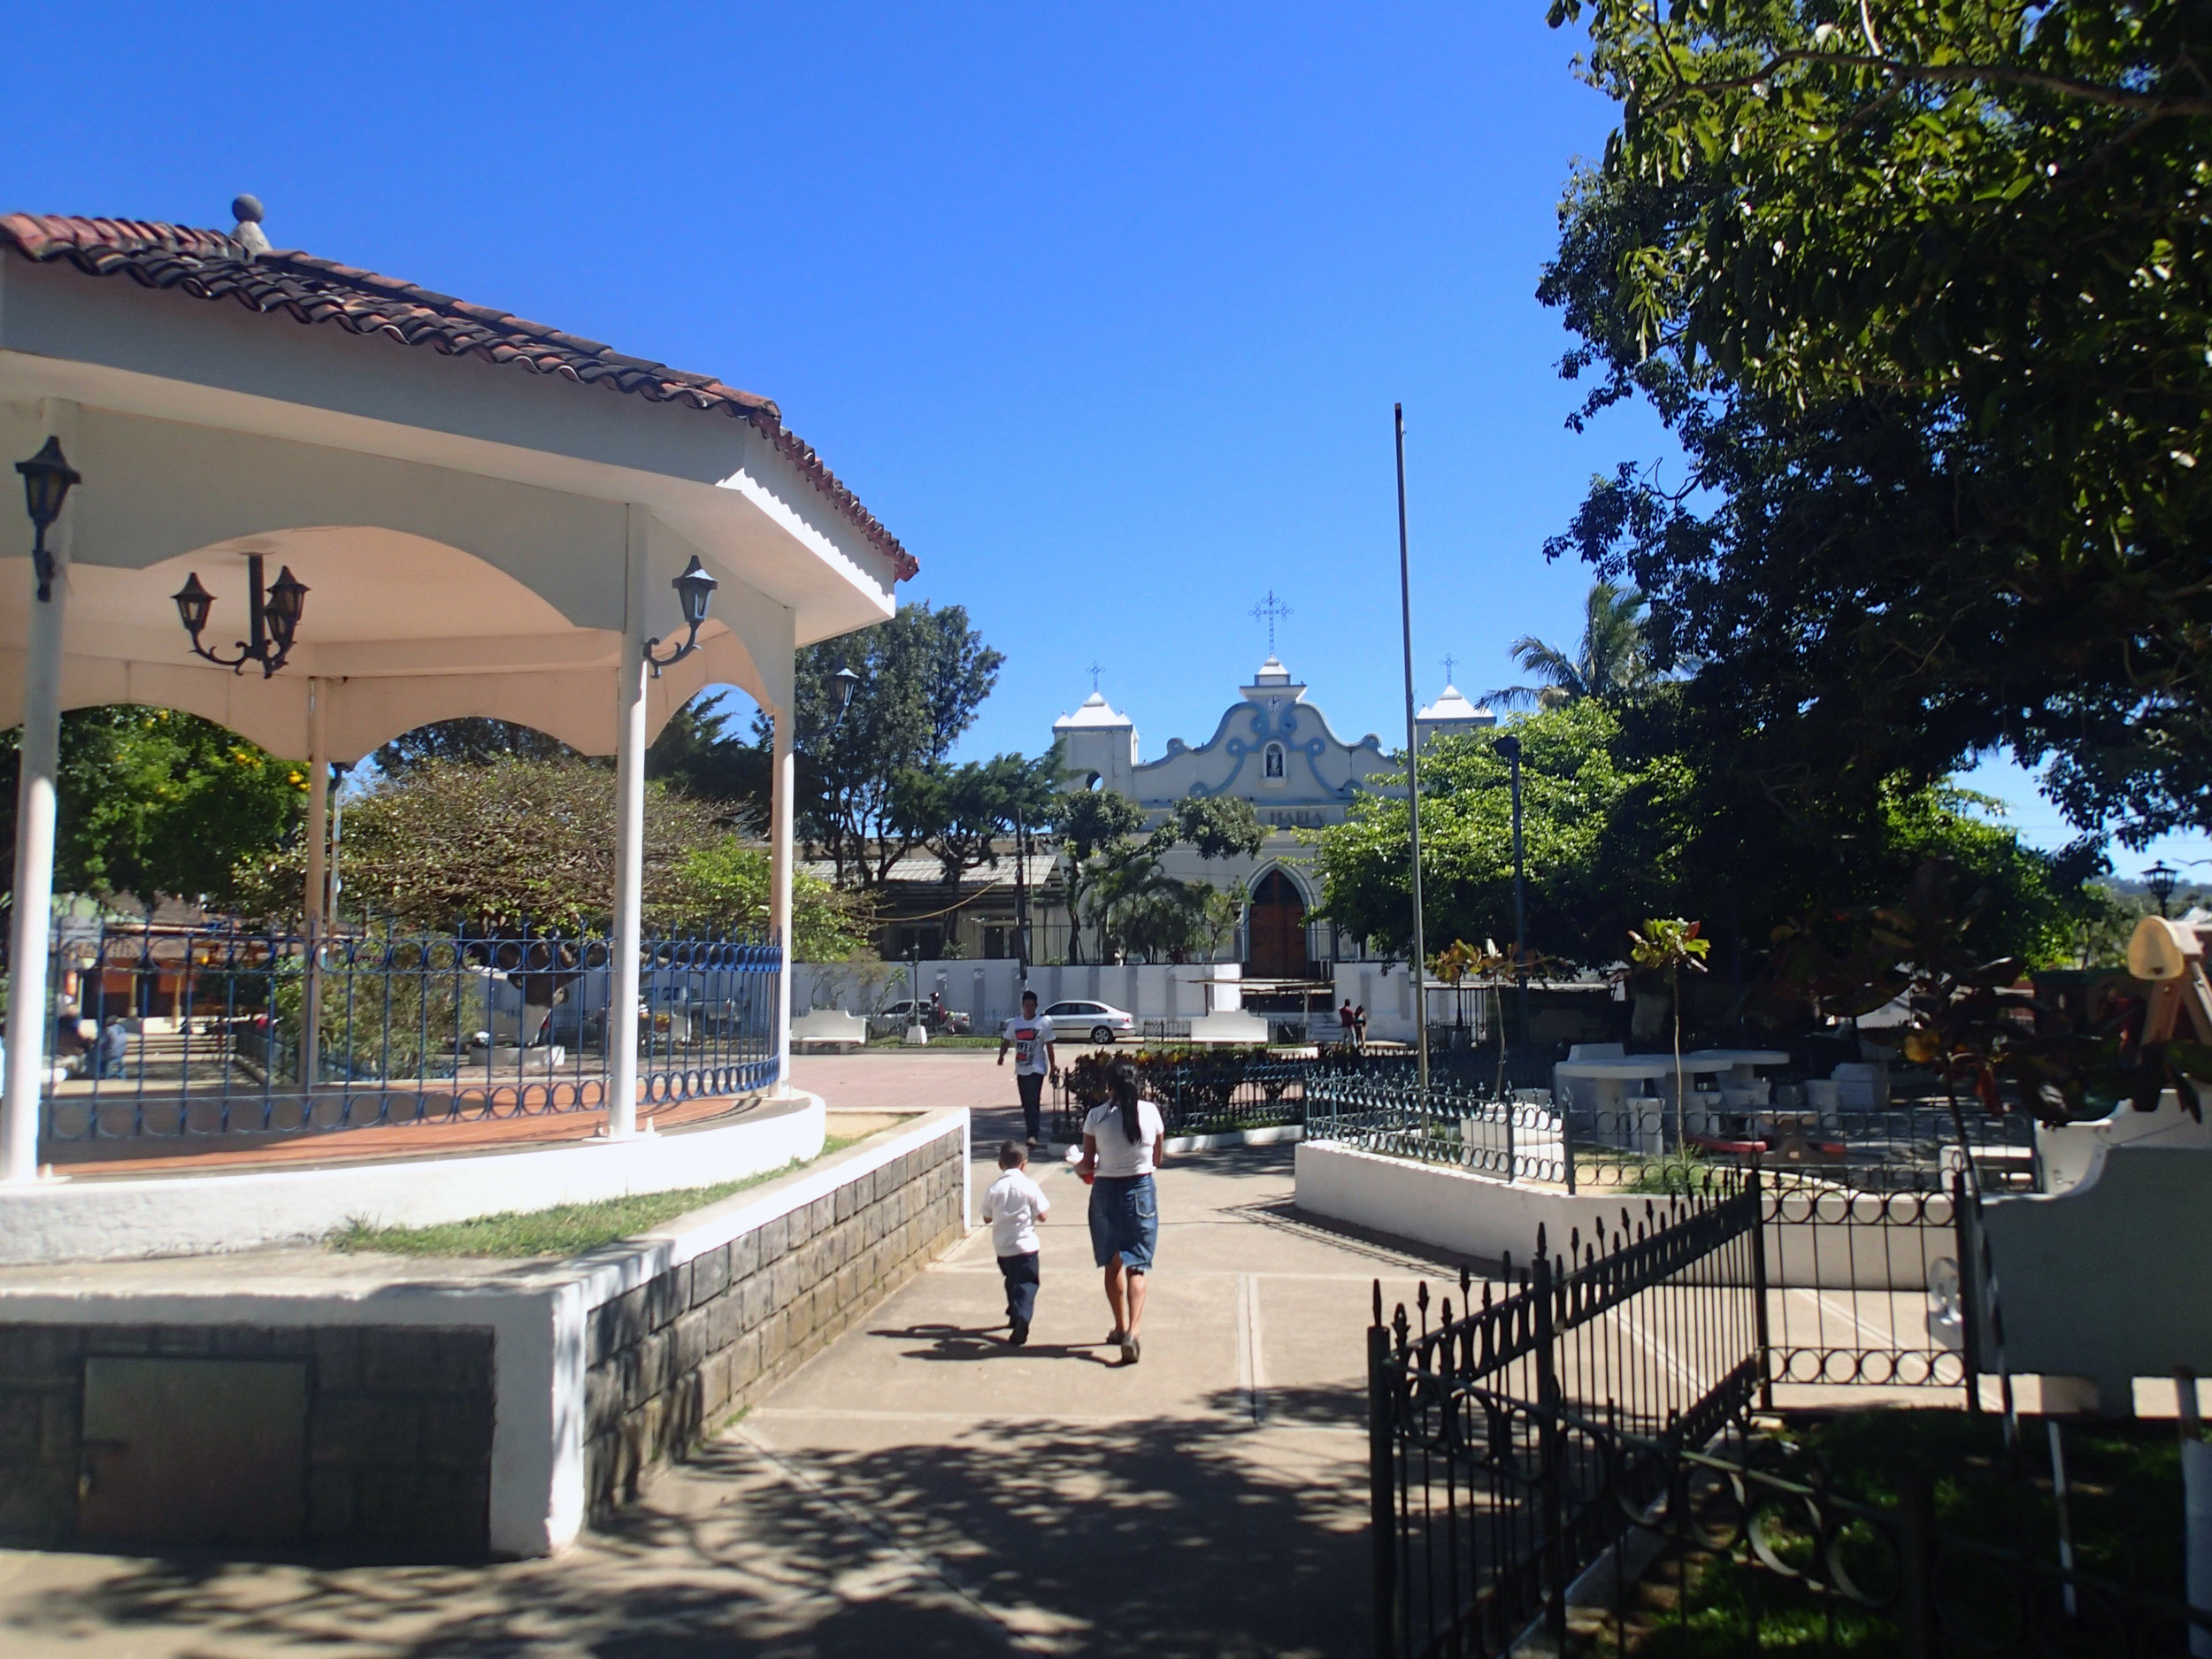 parque central Ataco.jpg